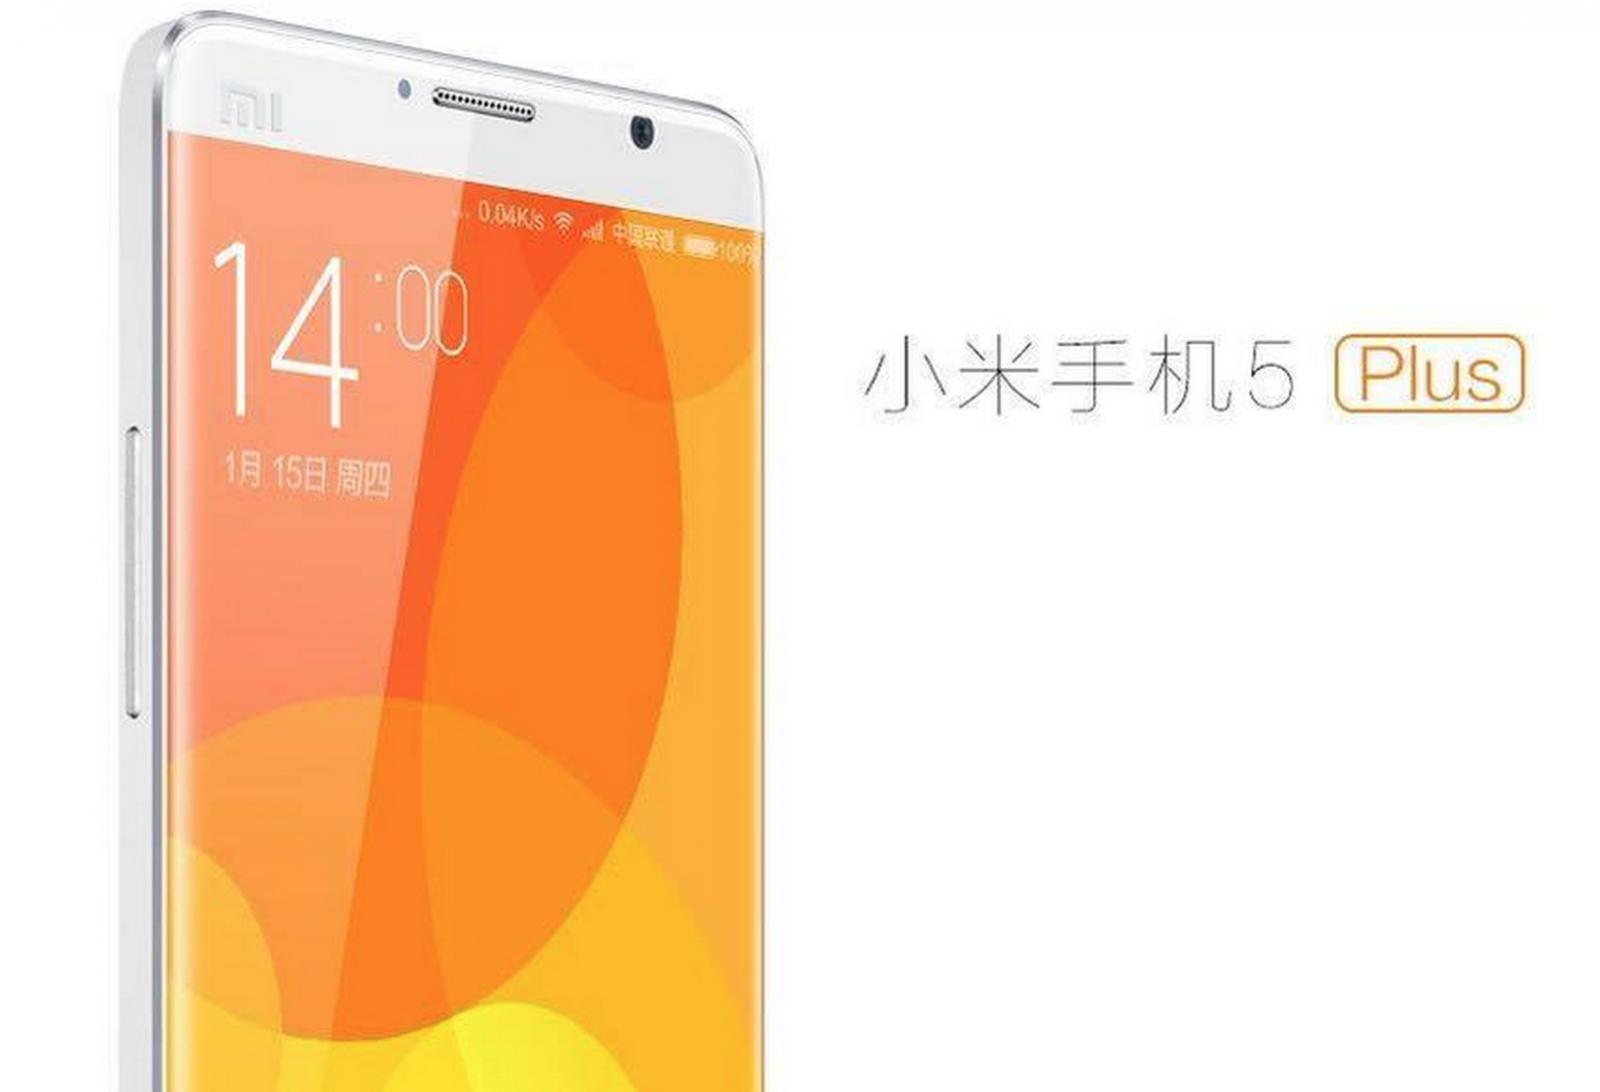 Xiaomi Mi 5 Plus leaked image